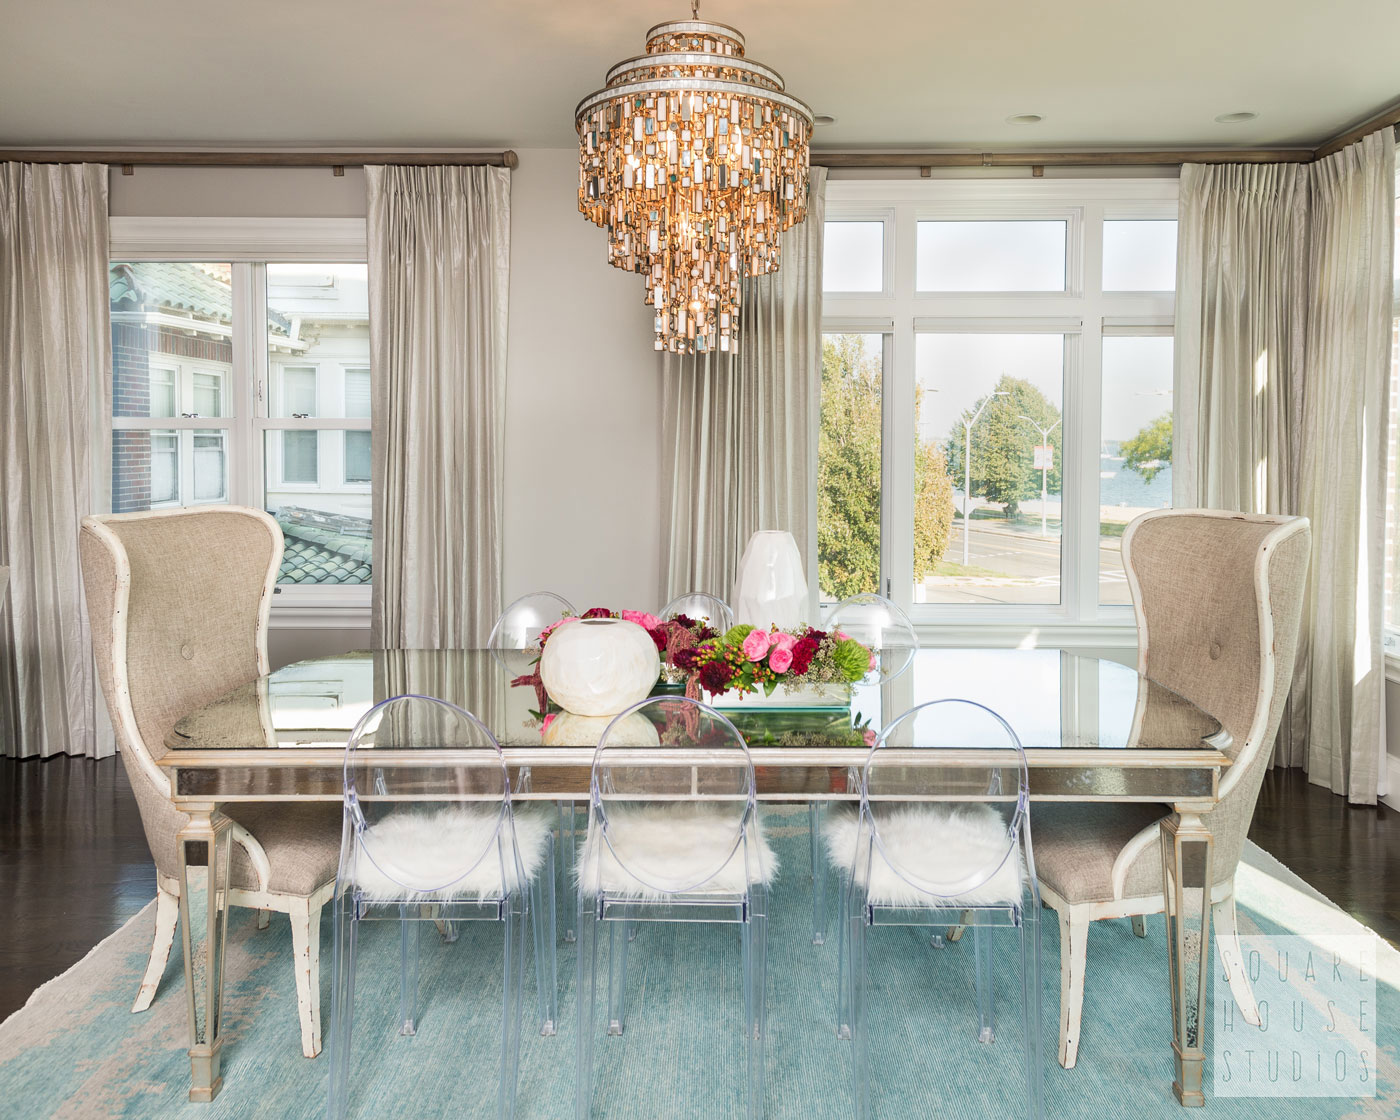 squarehousestudios-dining-room-wide.jpg